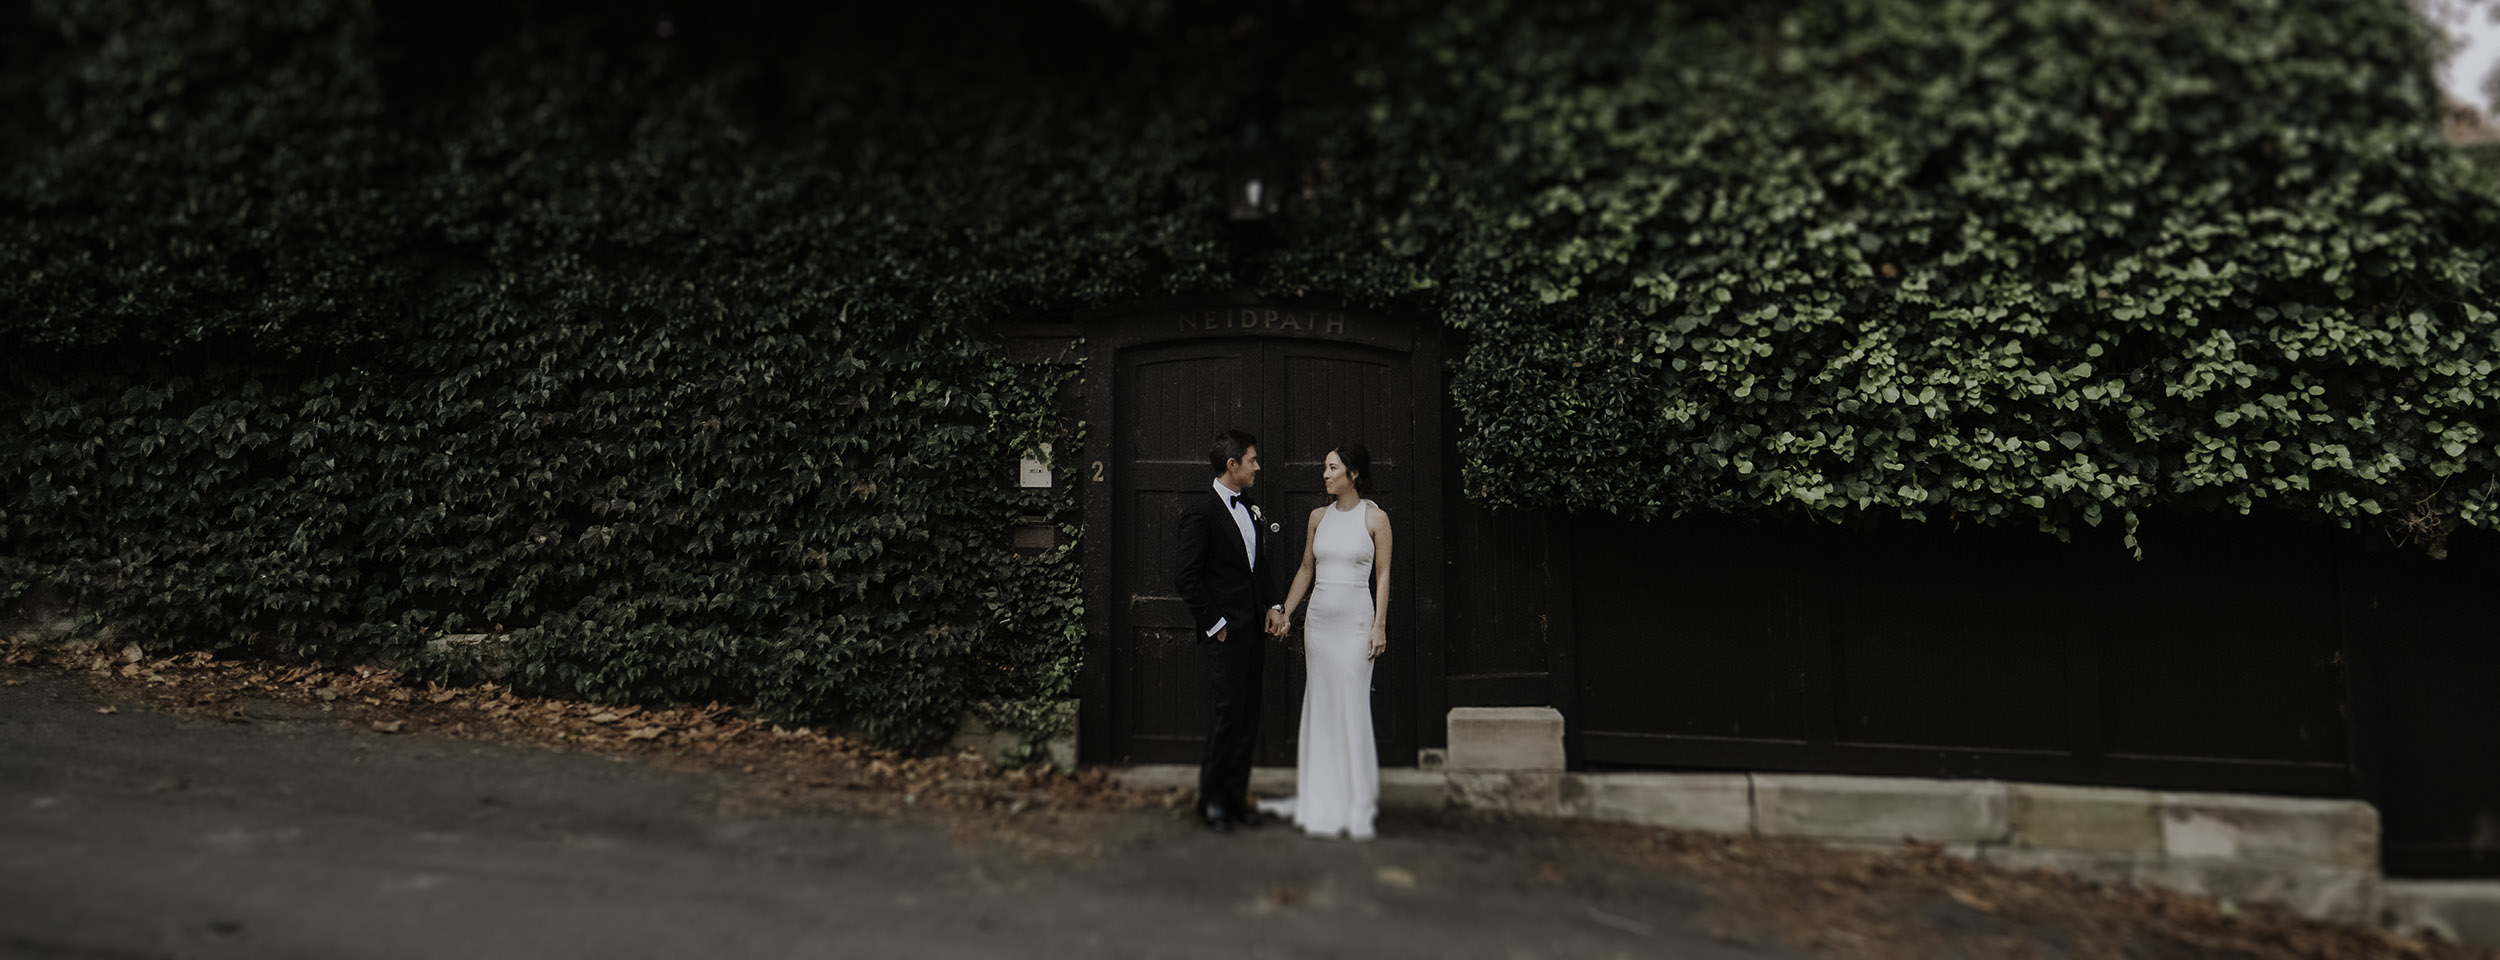 sydney-wedding-photographer-3.jpg